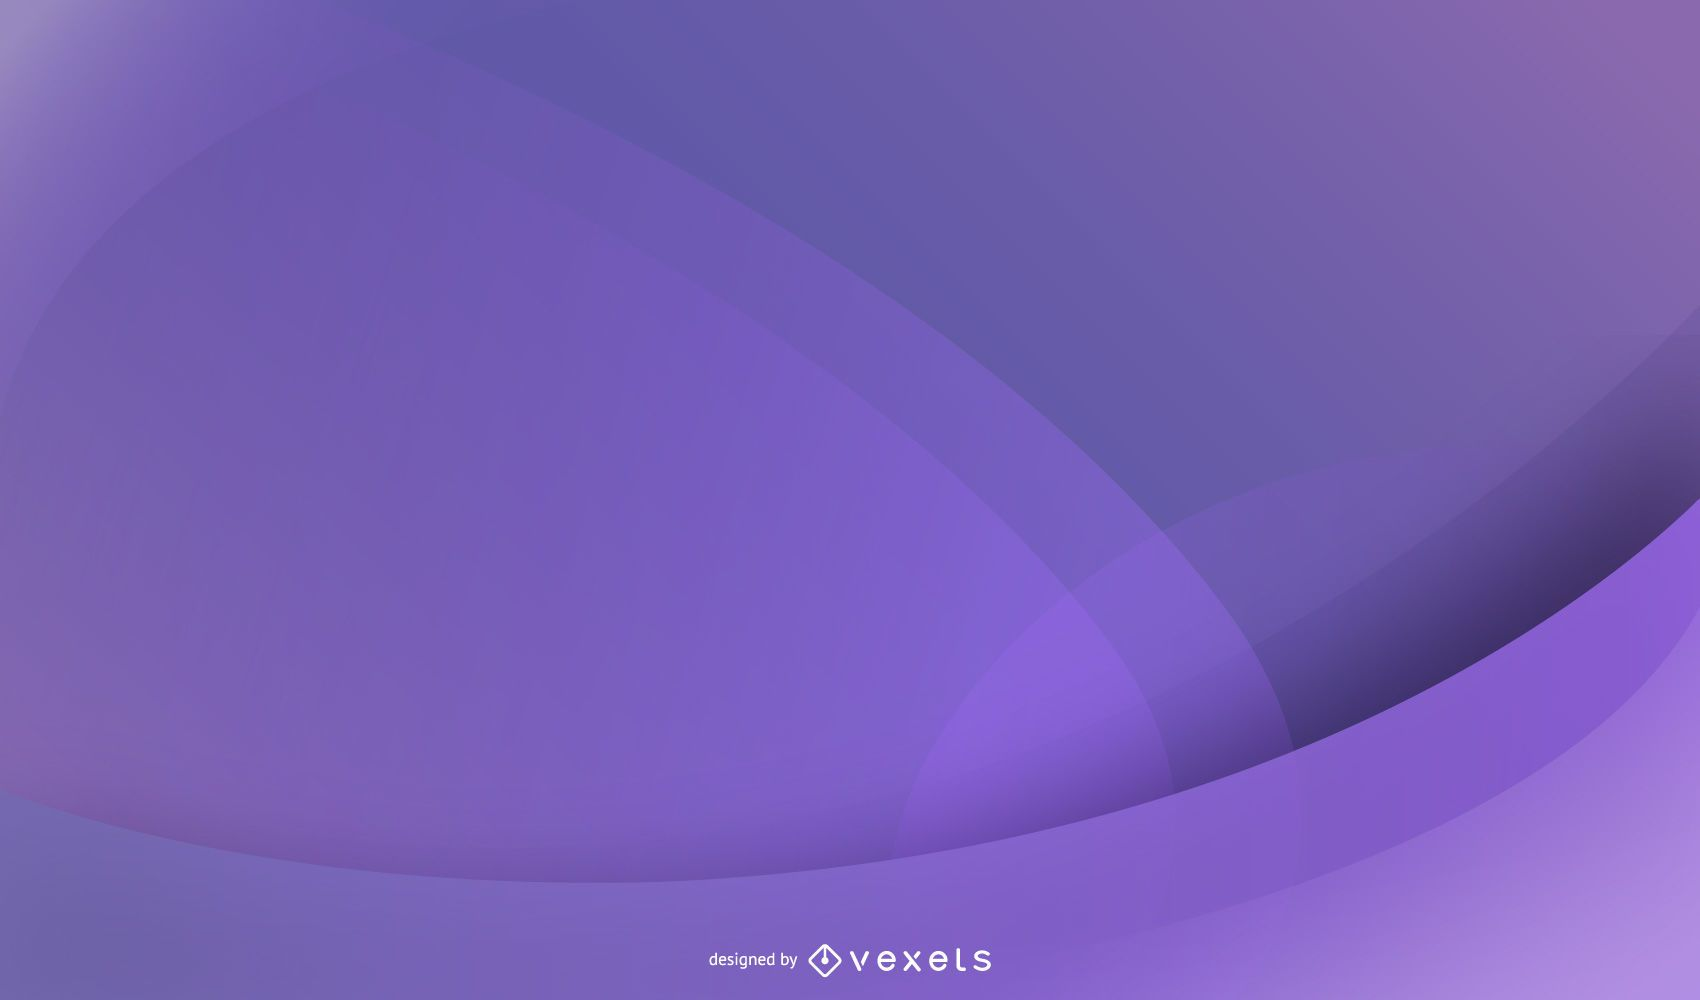 Resumen gráfico de vector de fondo azul púrpura